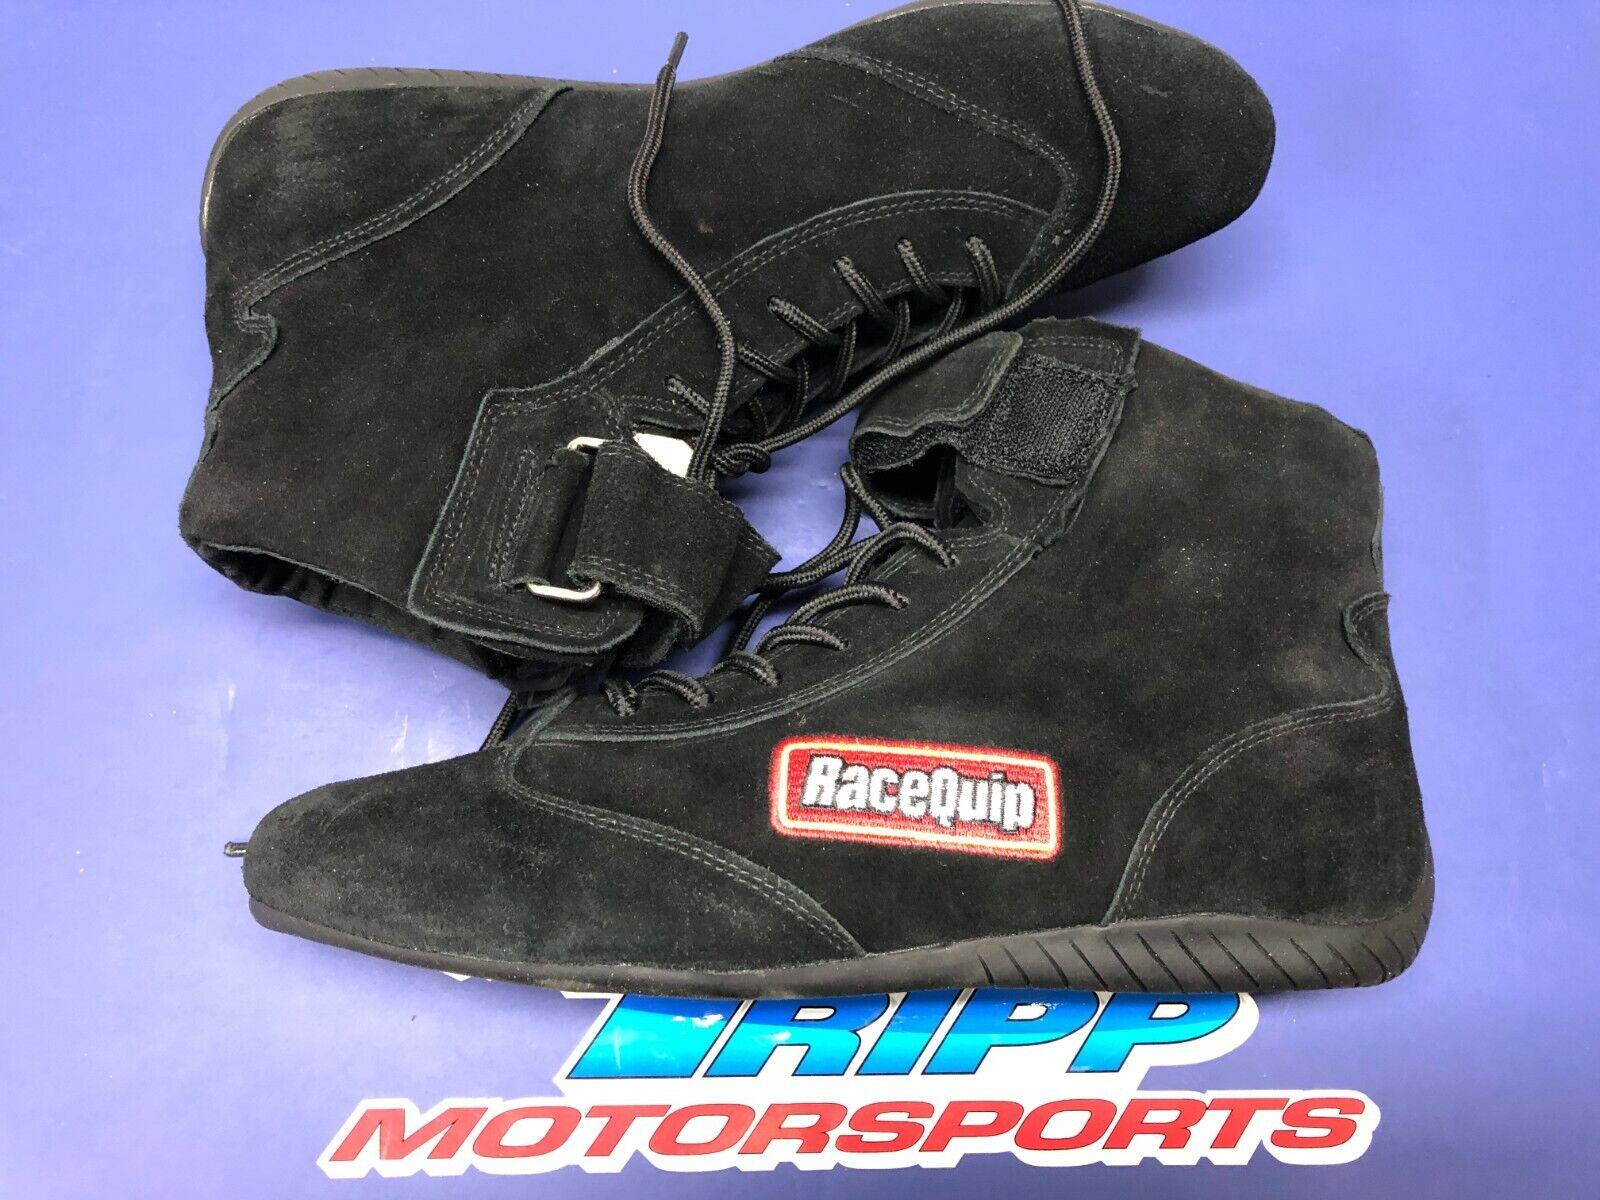 RaceQuip 30500090 Size 9 Euro SFI Racing Driving Shoes Black Suede Carbon-L